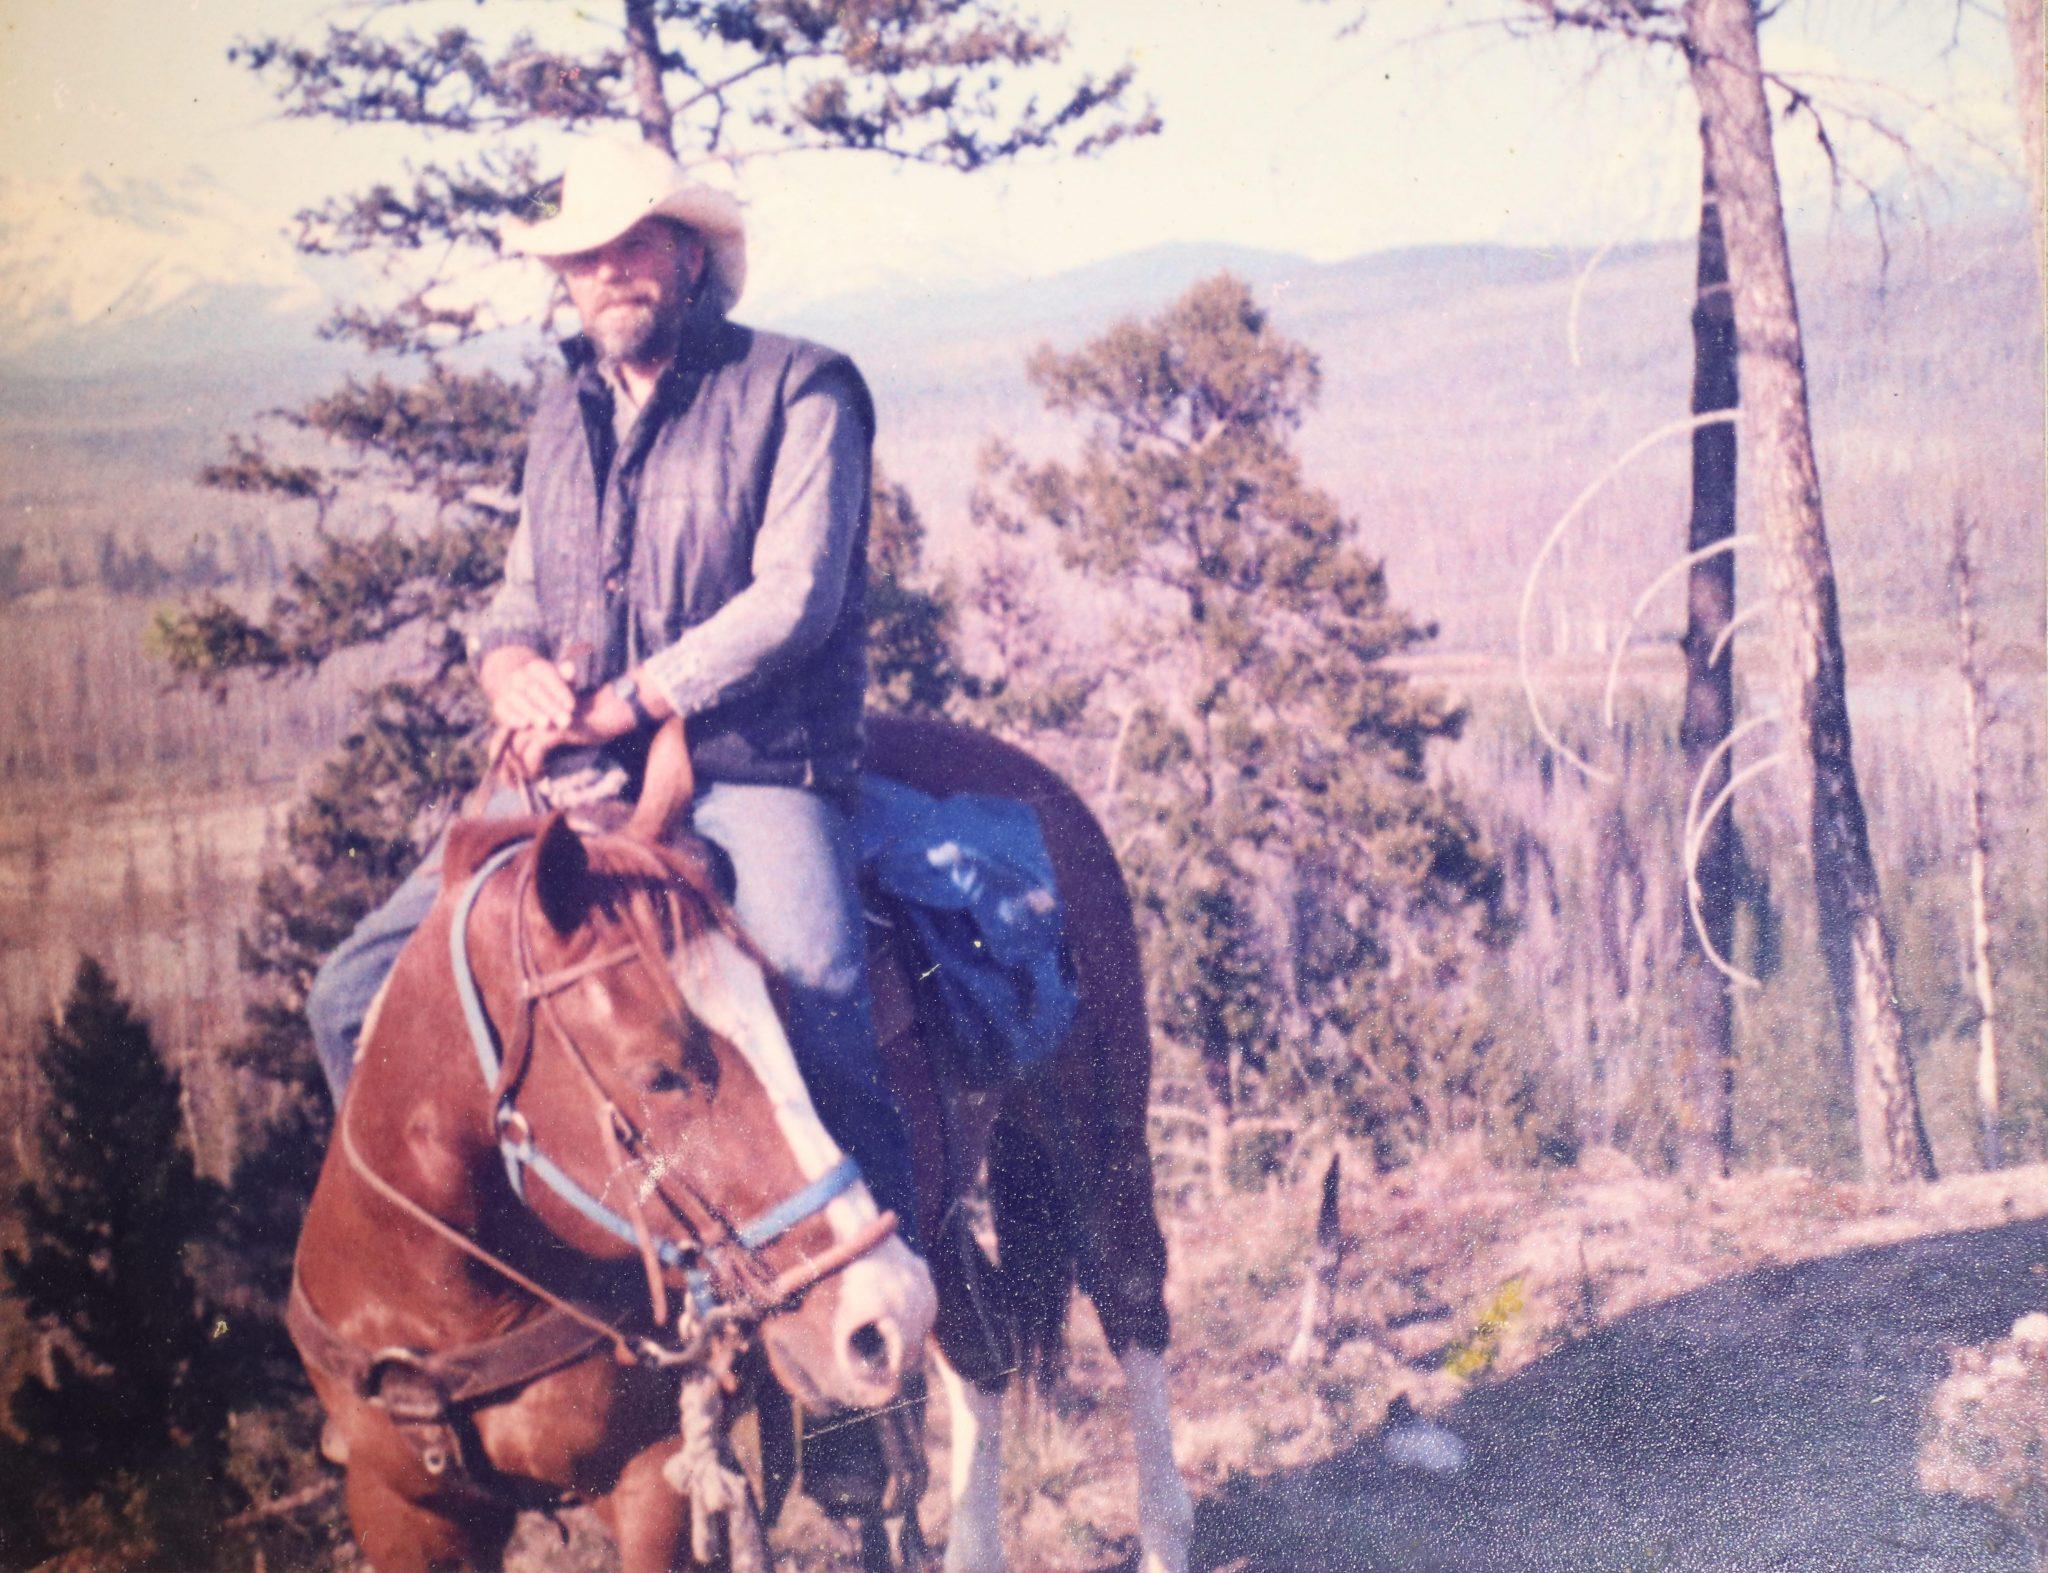 Young Tim Sullivan wearing a cowboy hat, riding horseback.